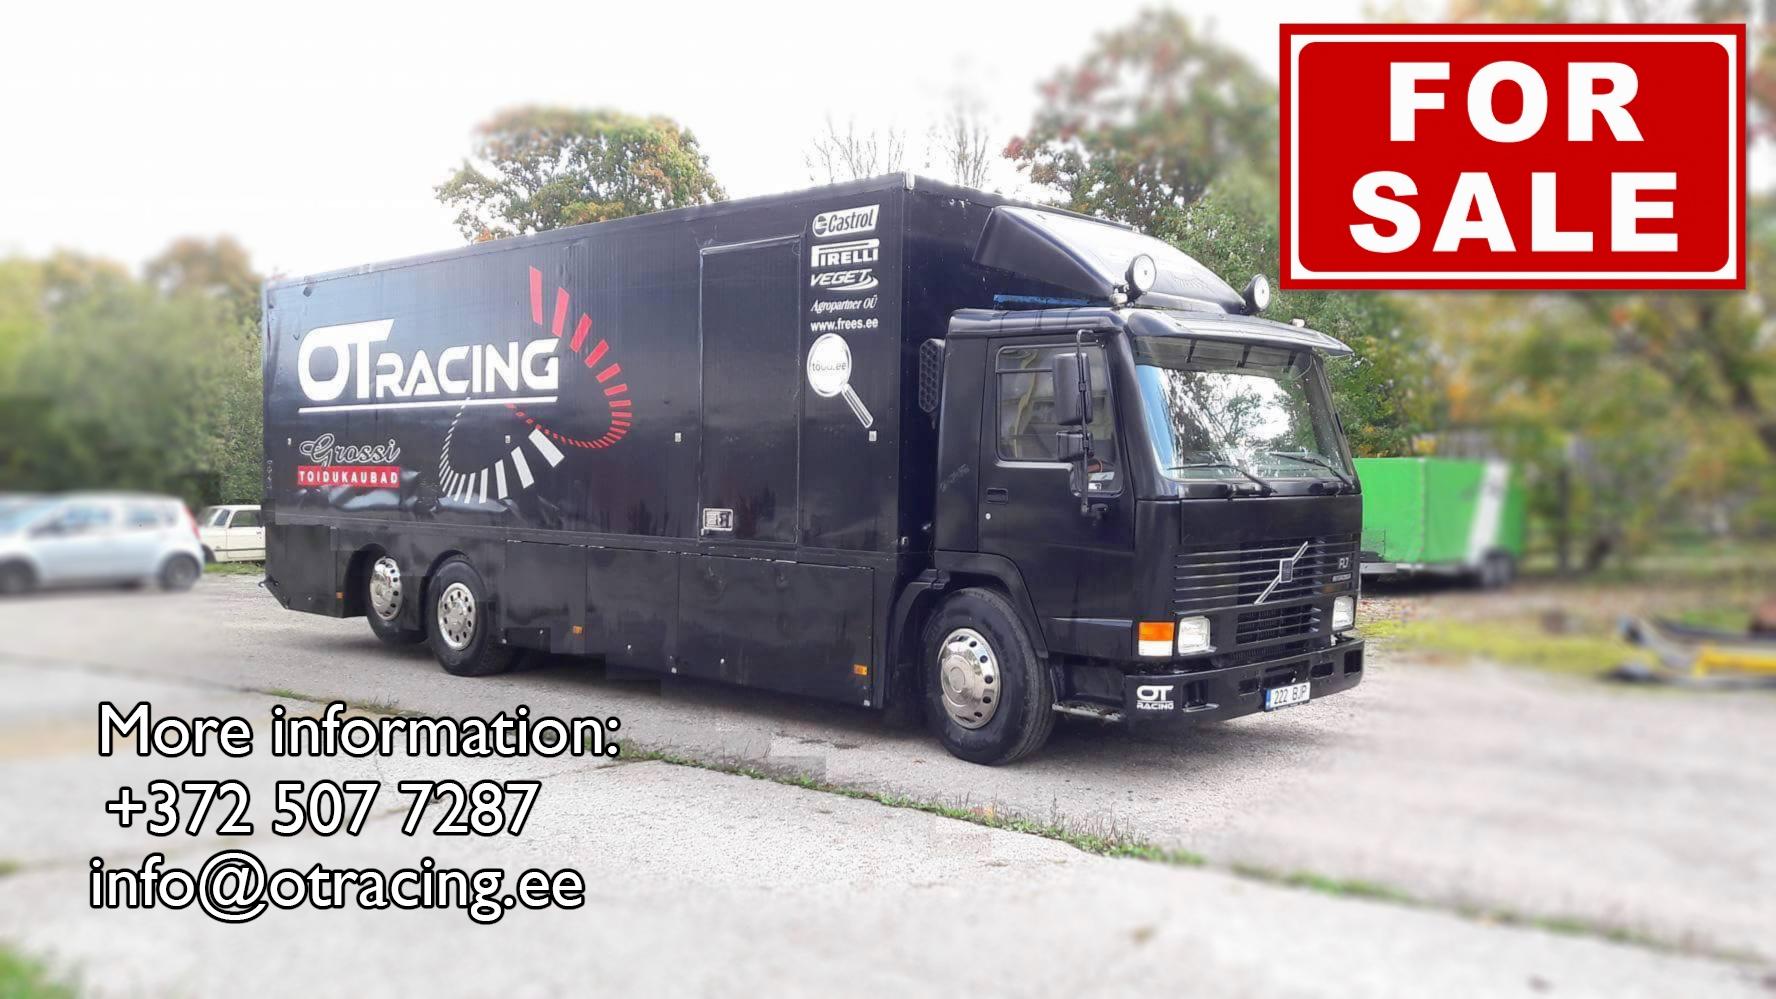 ot-racing-service-truck